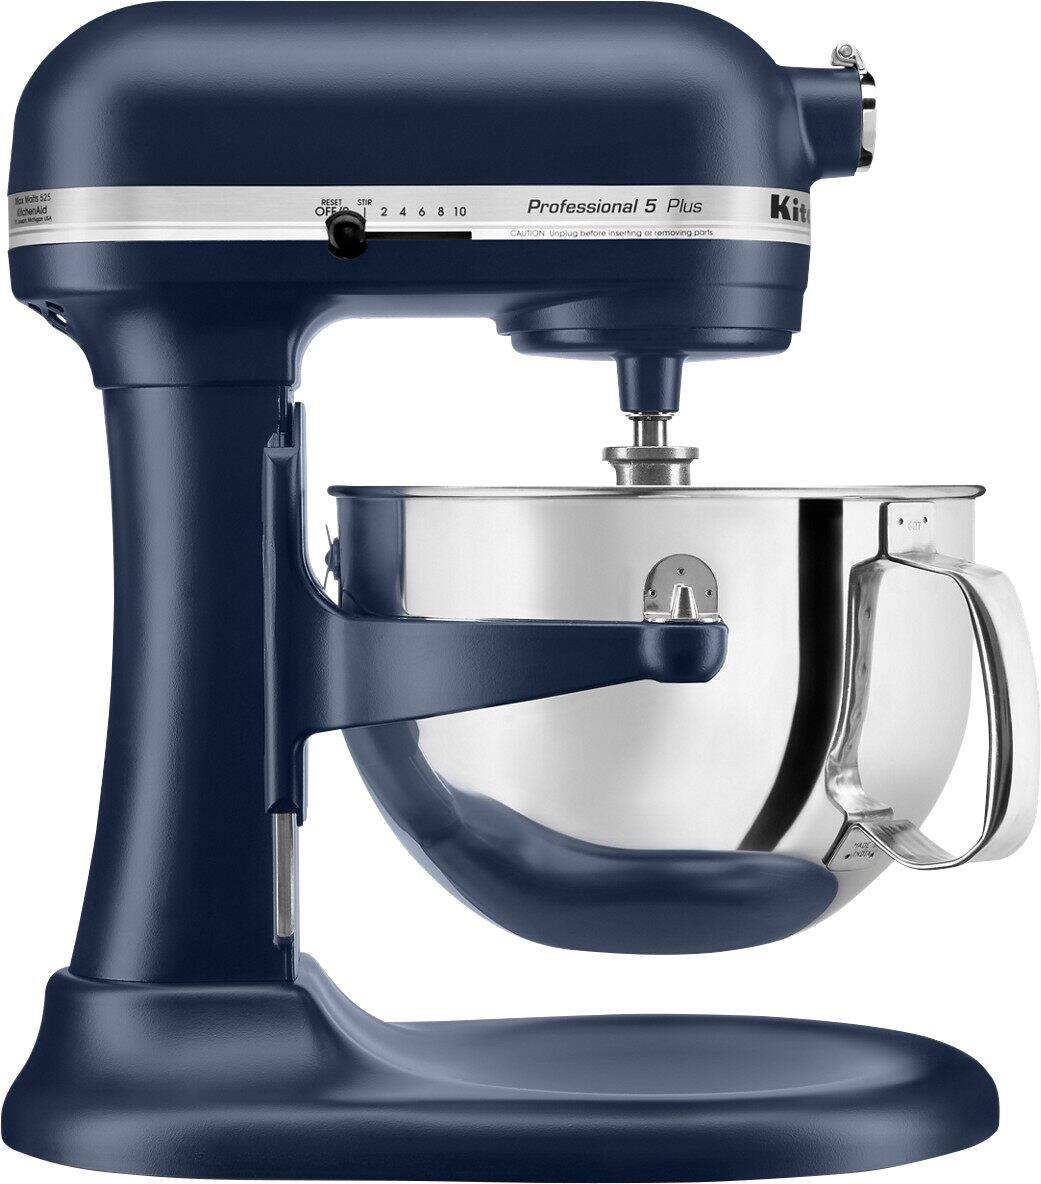 KitchenAid Pro 5 Plus Series Bowl-lift Stand Mixer (various colors)